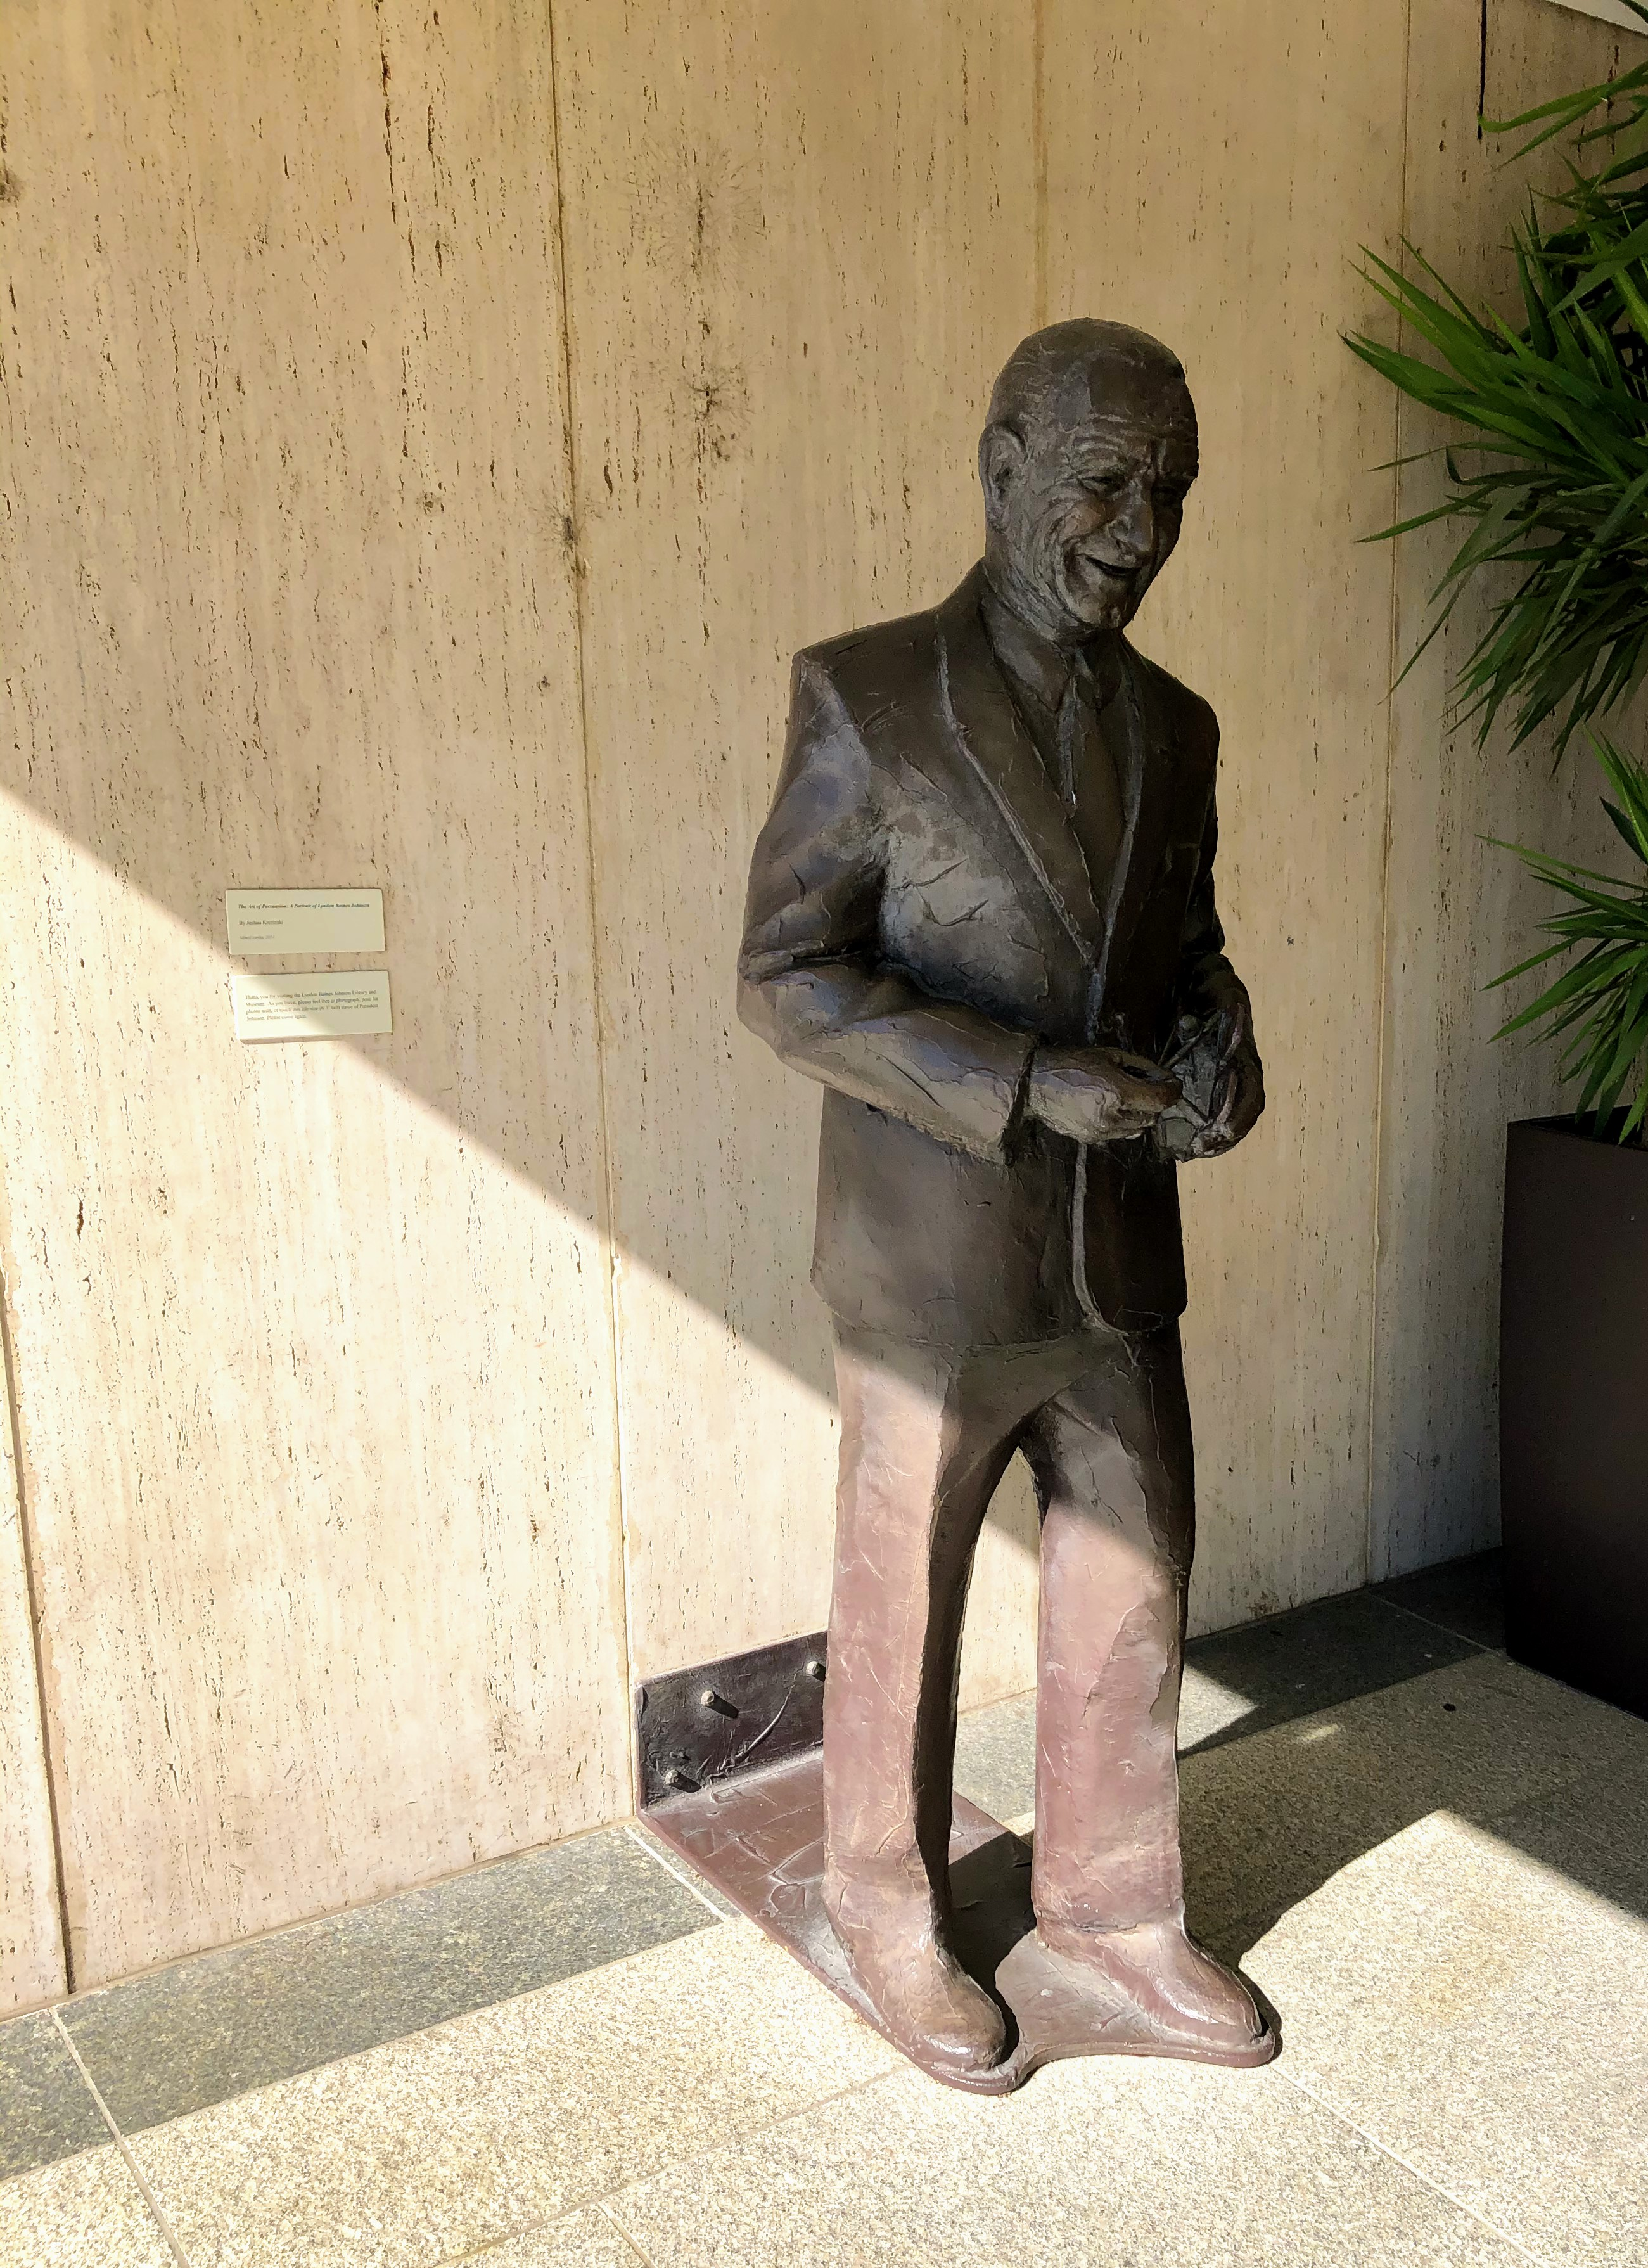 LBJ statue